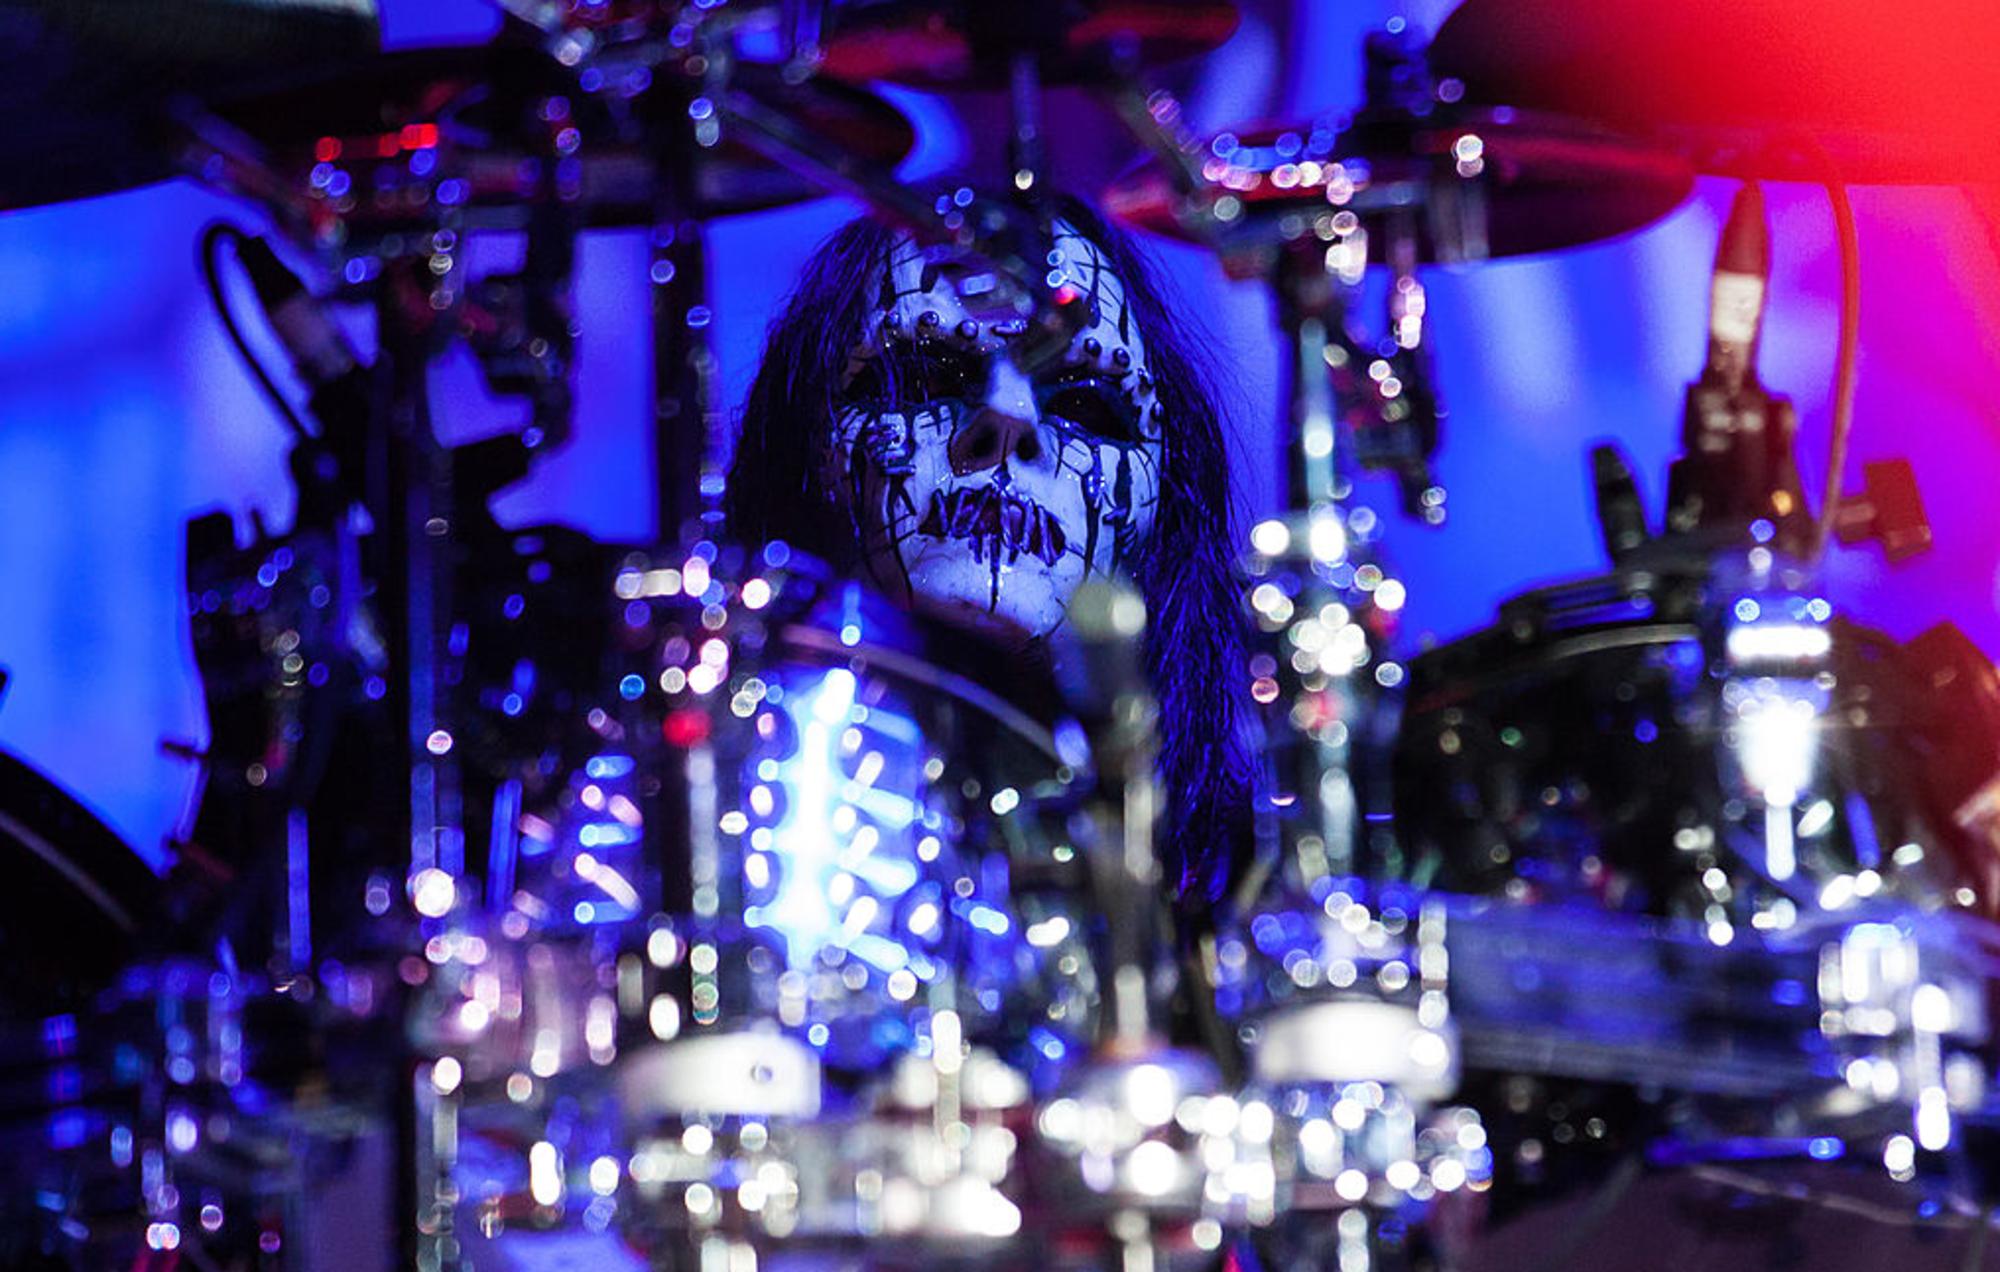 Joey Jordison remembered by Roadrunner A&R who signed Slipknot